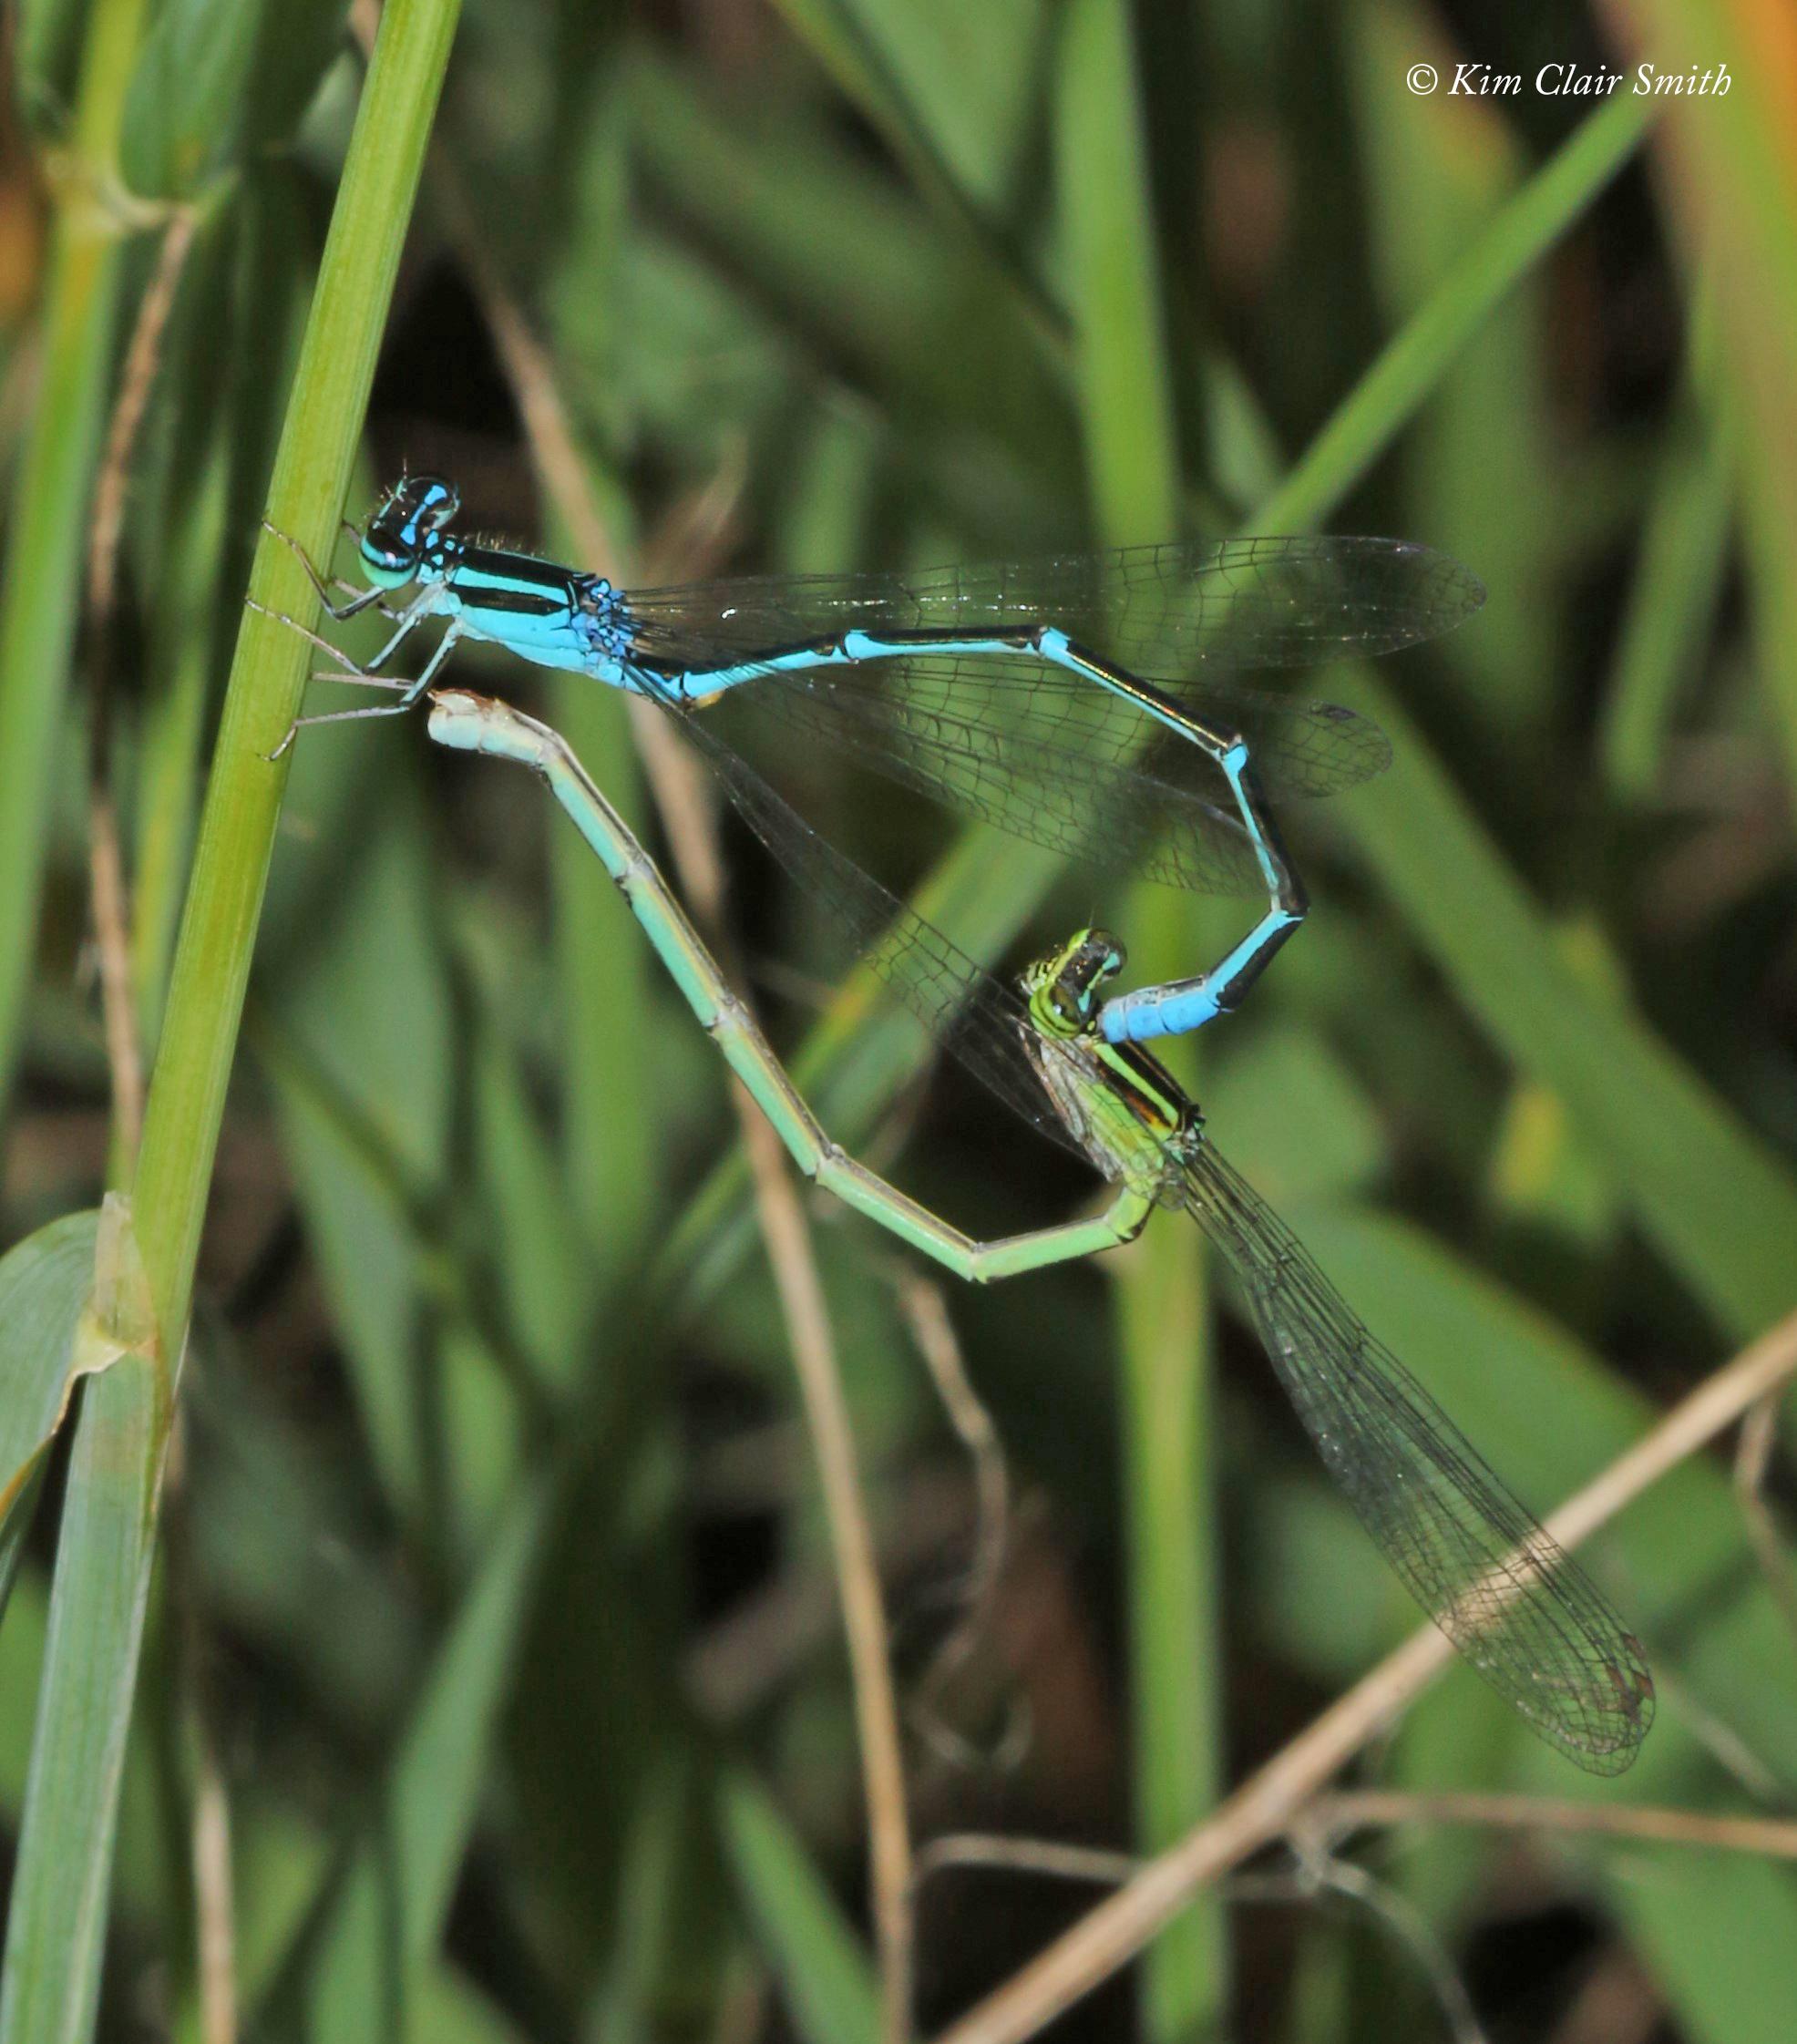 Stream bluet pair in tandem - step 2 - w sig